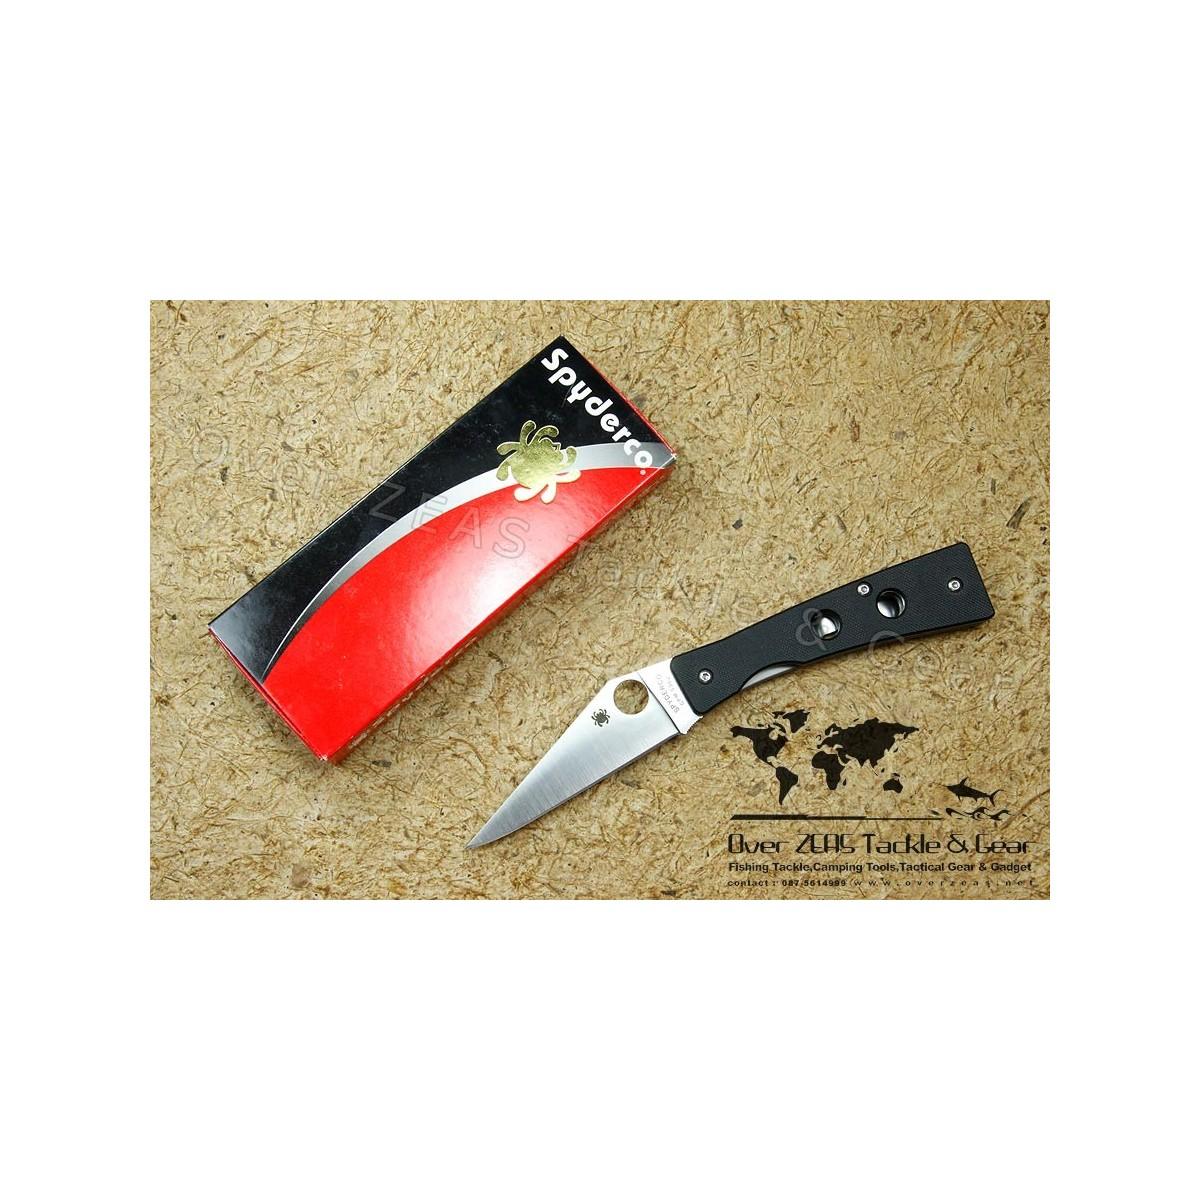 "Spyderco Chokwe Folding Knife 3.75"" S30V Blade, G10 Handles"